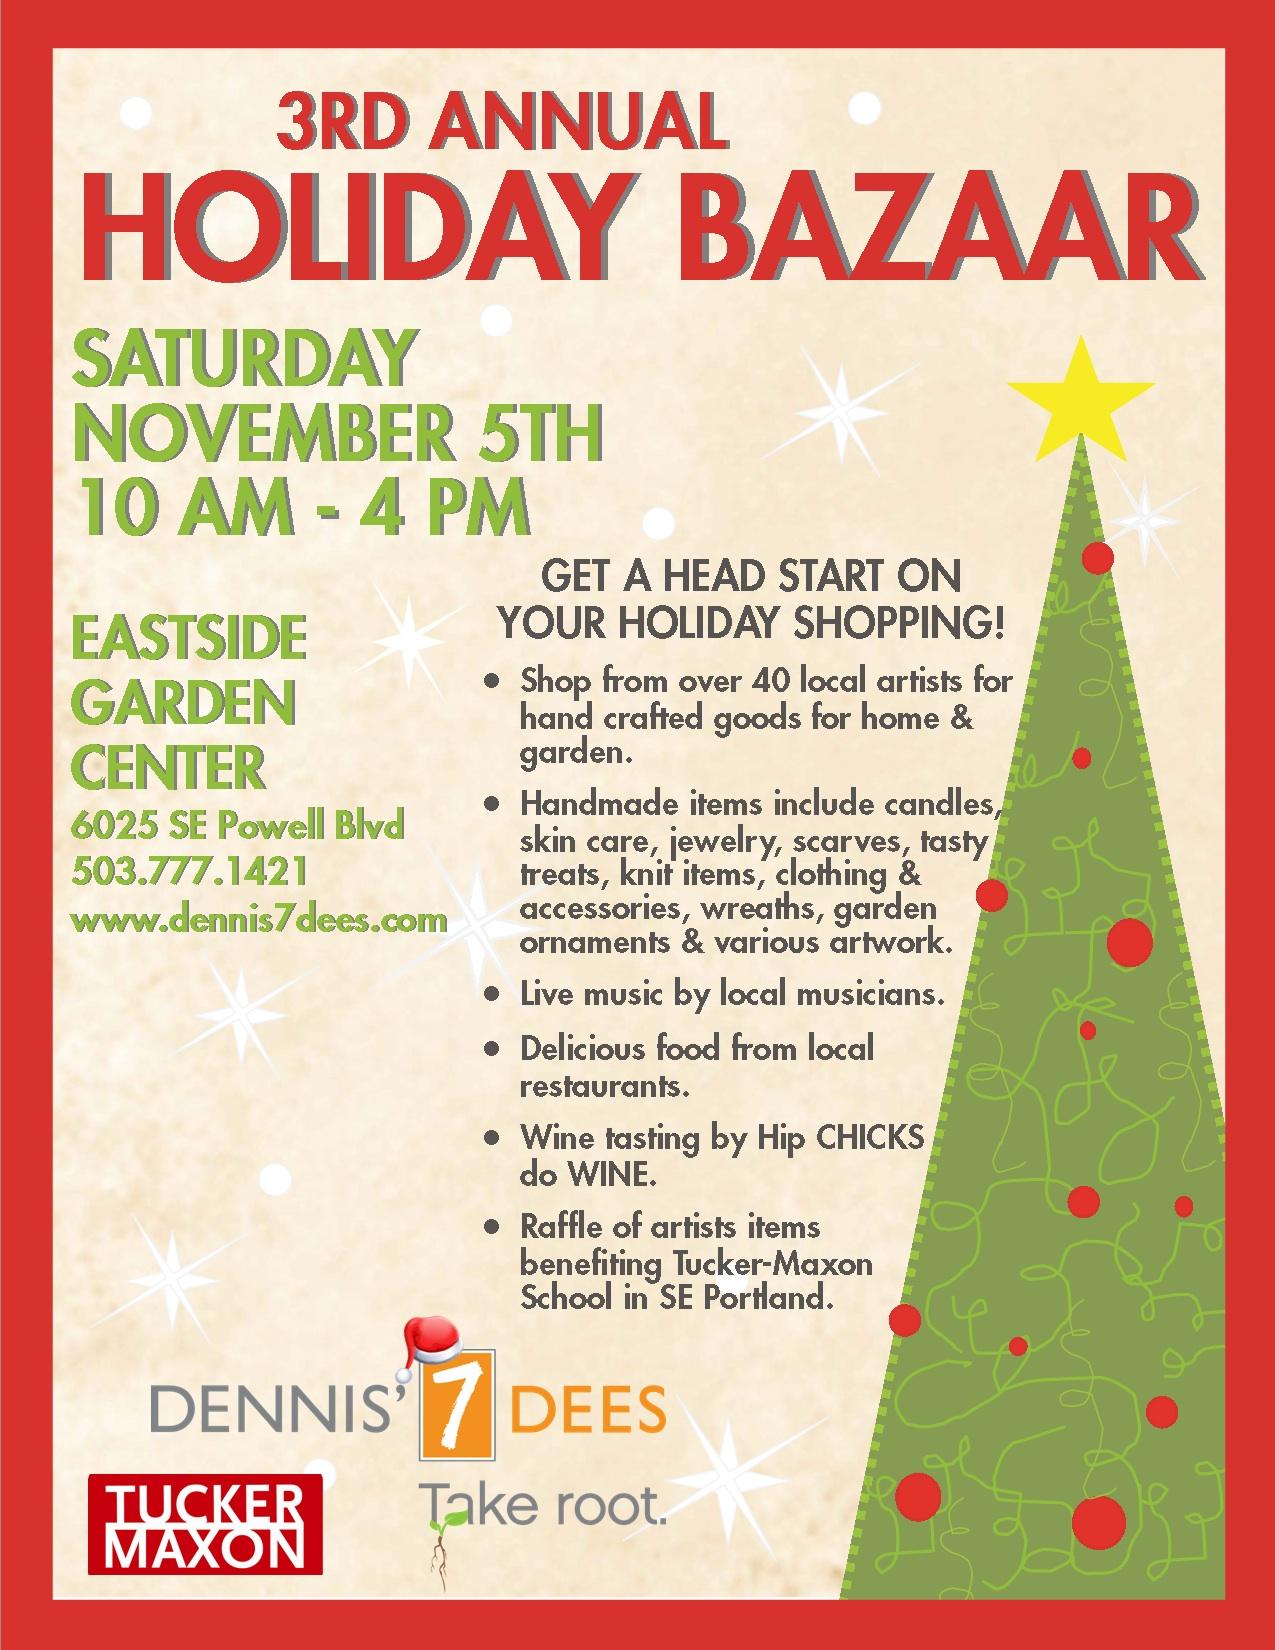 how to make flyer for church holiday bazaar mersn proforum co